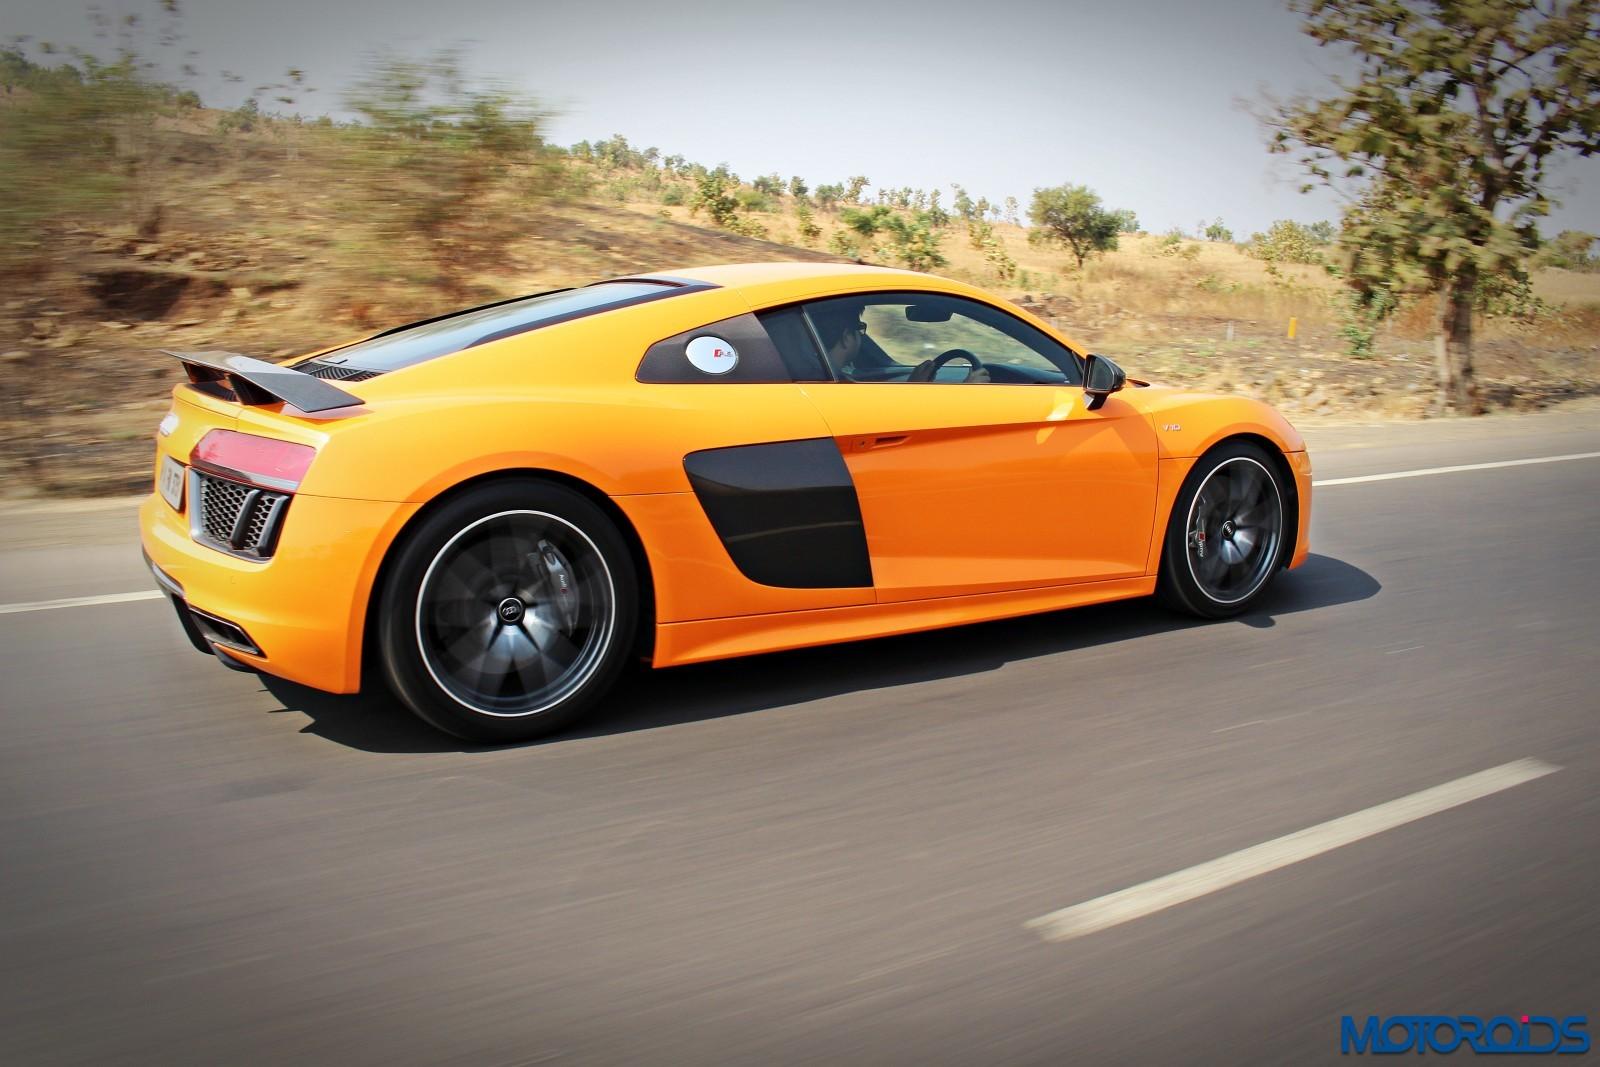 New-Audi-R8-V10-Plus-india-review-4